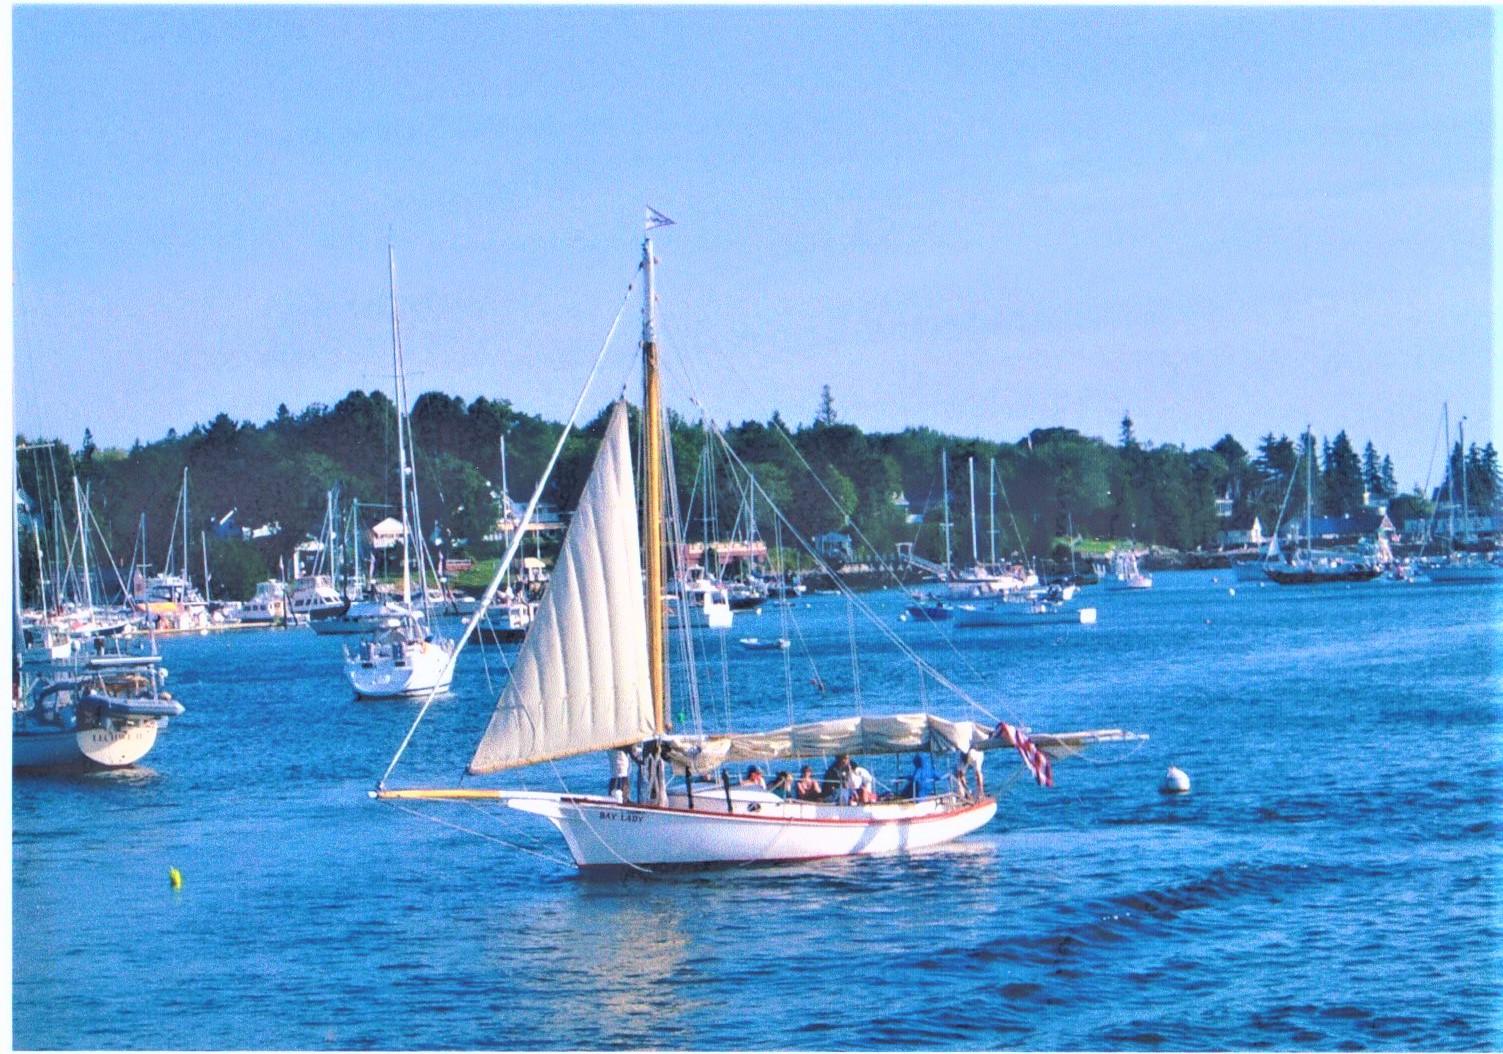 U.S. Travel: Damariscotta, Maine Is Your Ideal Summer Get-Away - A ...